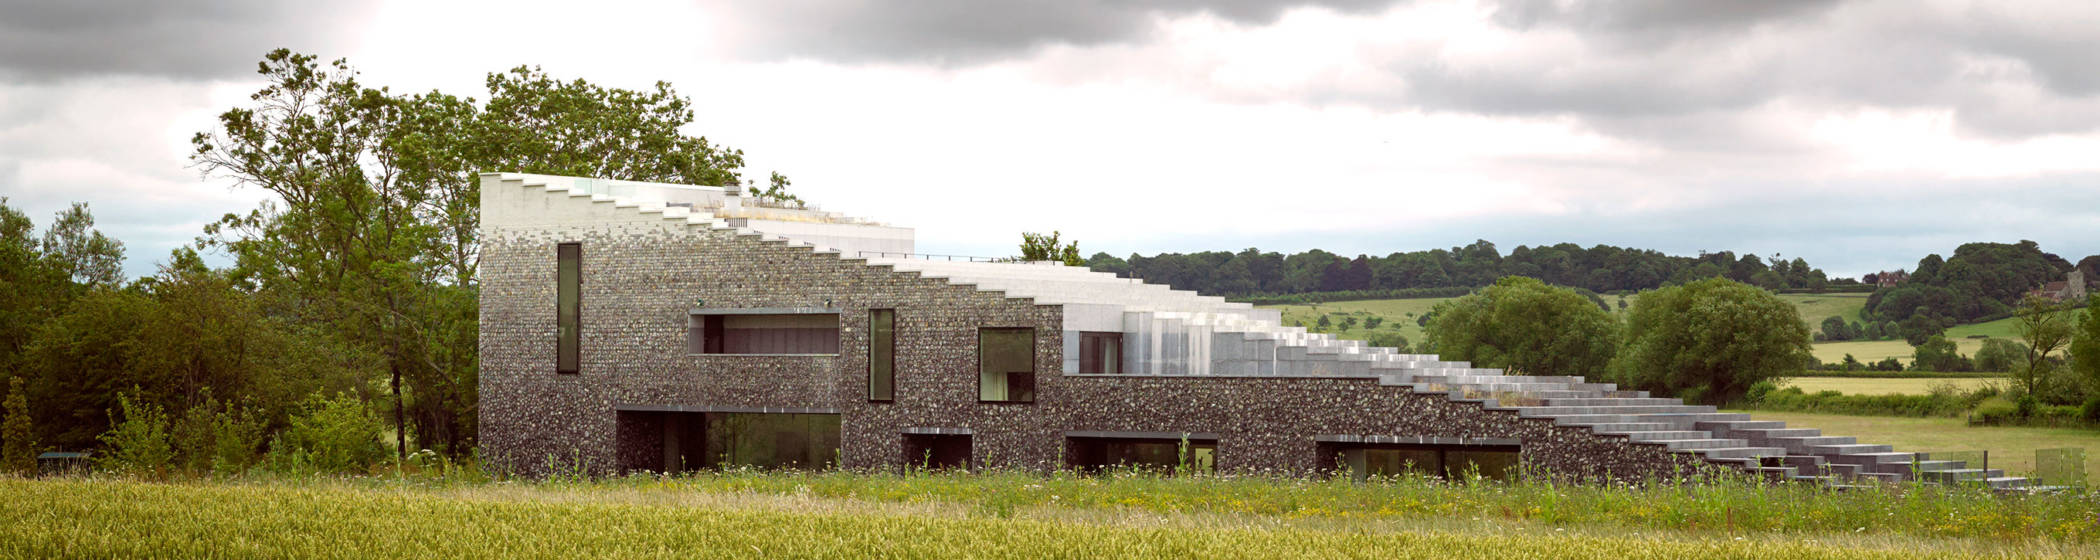 Flint house waddesdon manor for Home architecture newbury